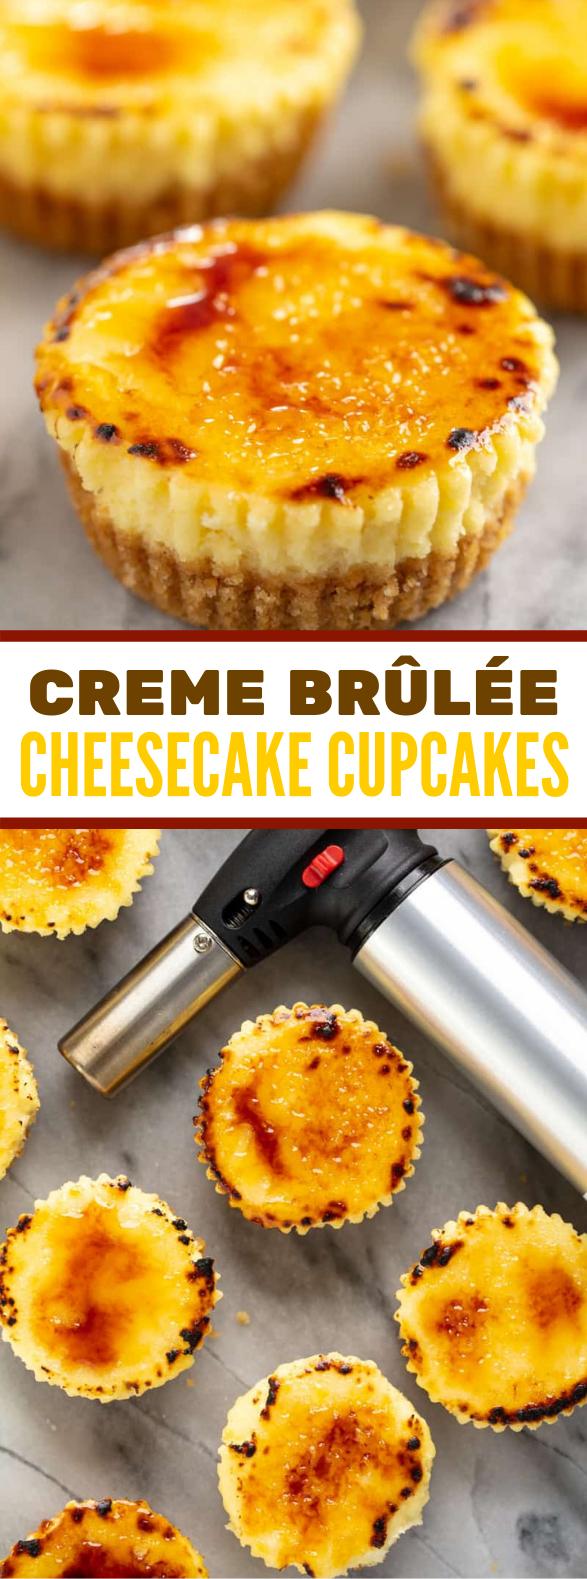 CREME BRÛLÉE CHEESECAKE CUPCAKES #desserts #cake